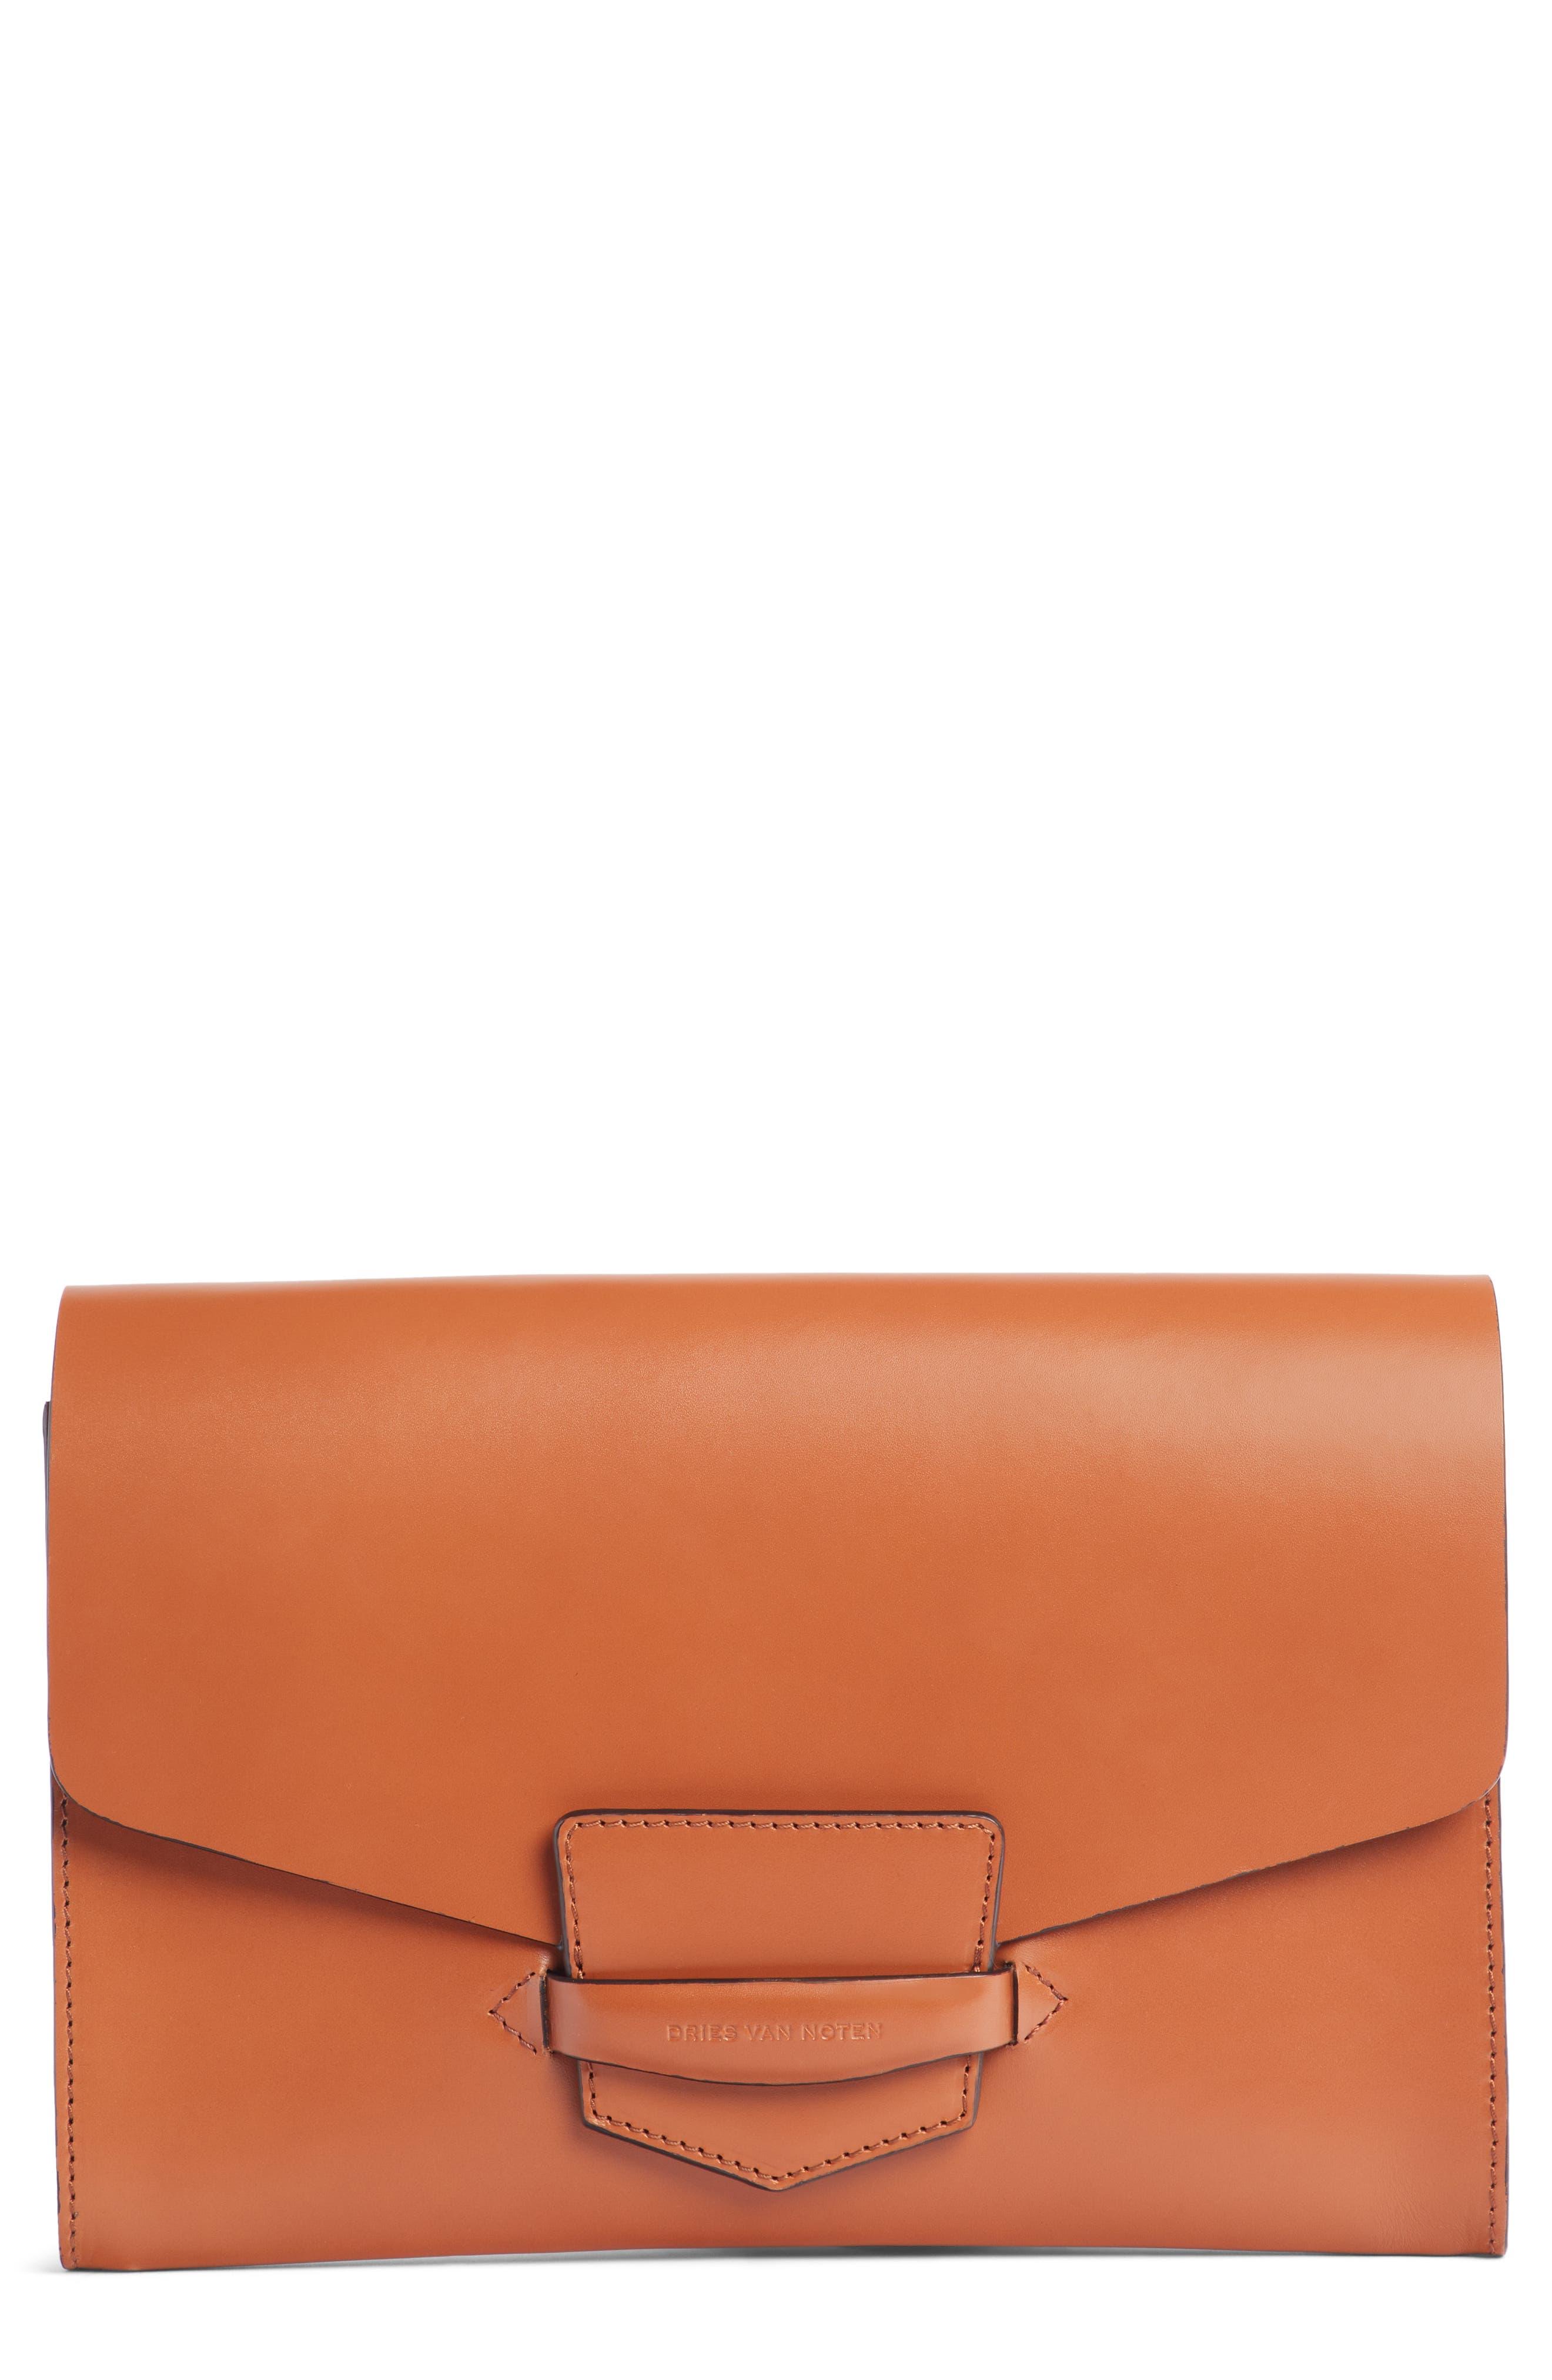 DRIES VAN NOTEN Leather Envelope Clutch, Main, color, 200